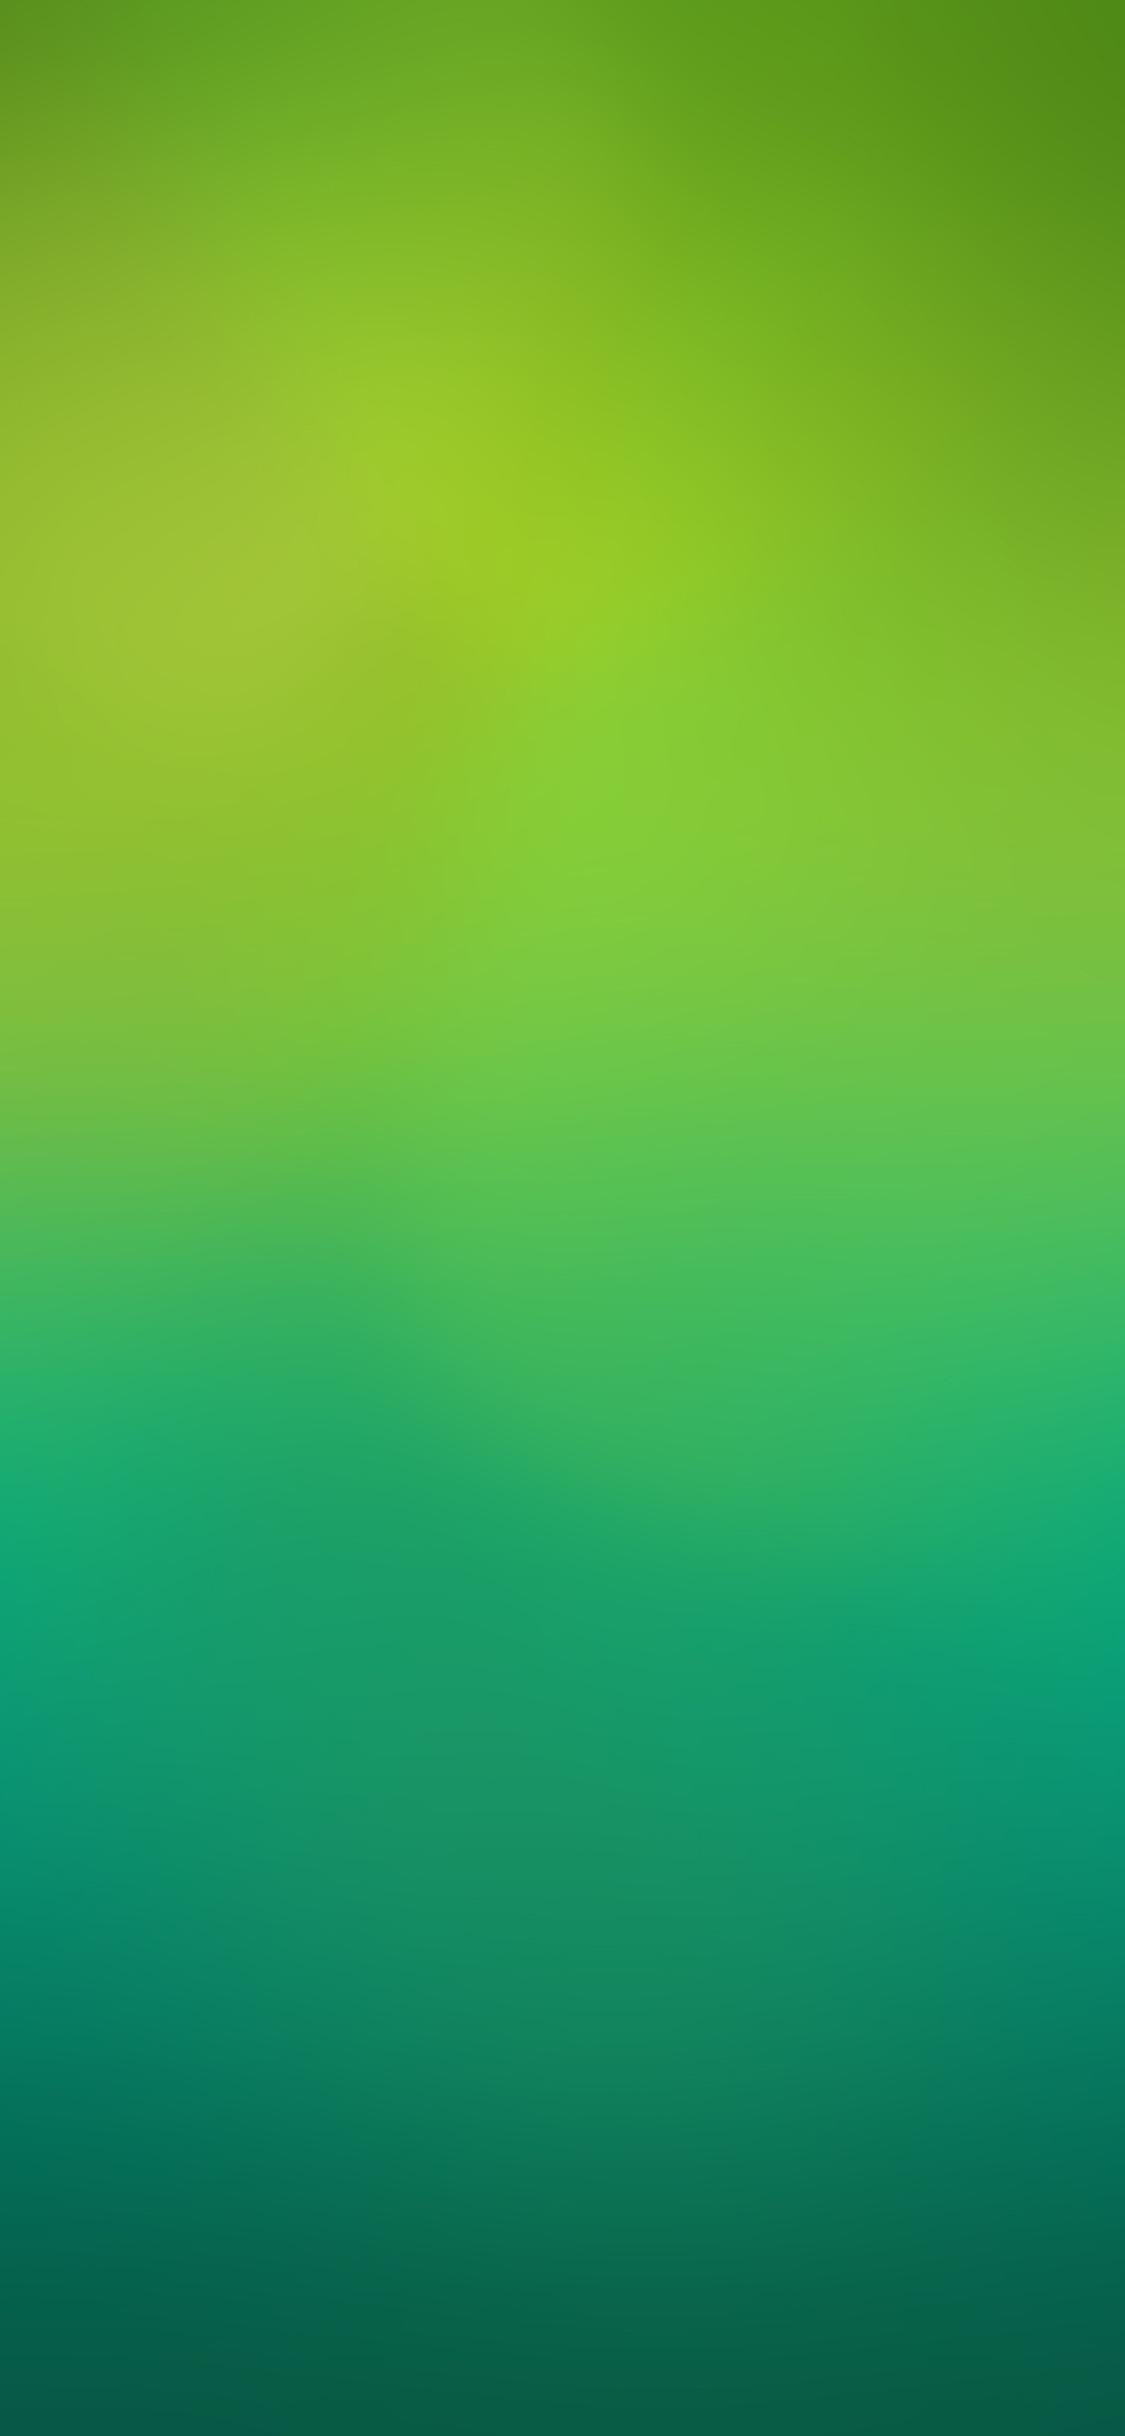 iPhoneXpapers.com-Apple-iPhone-wallpaper-sf67-green-yellow-peace-love-gradation-blur